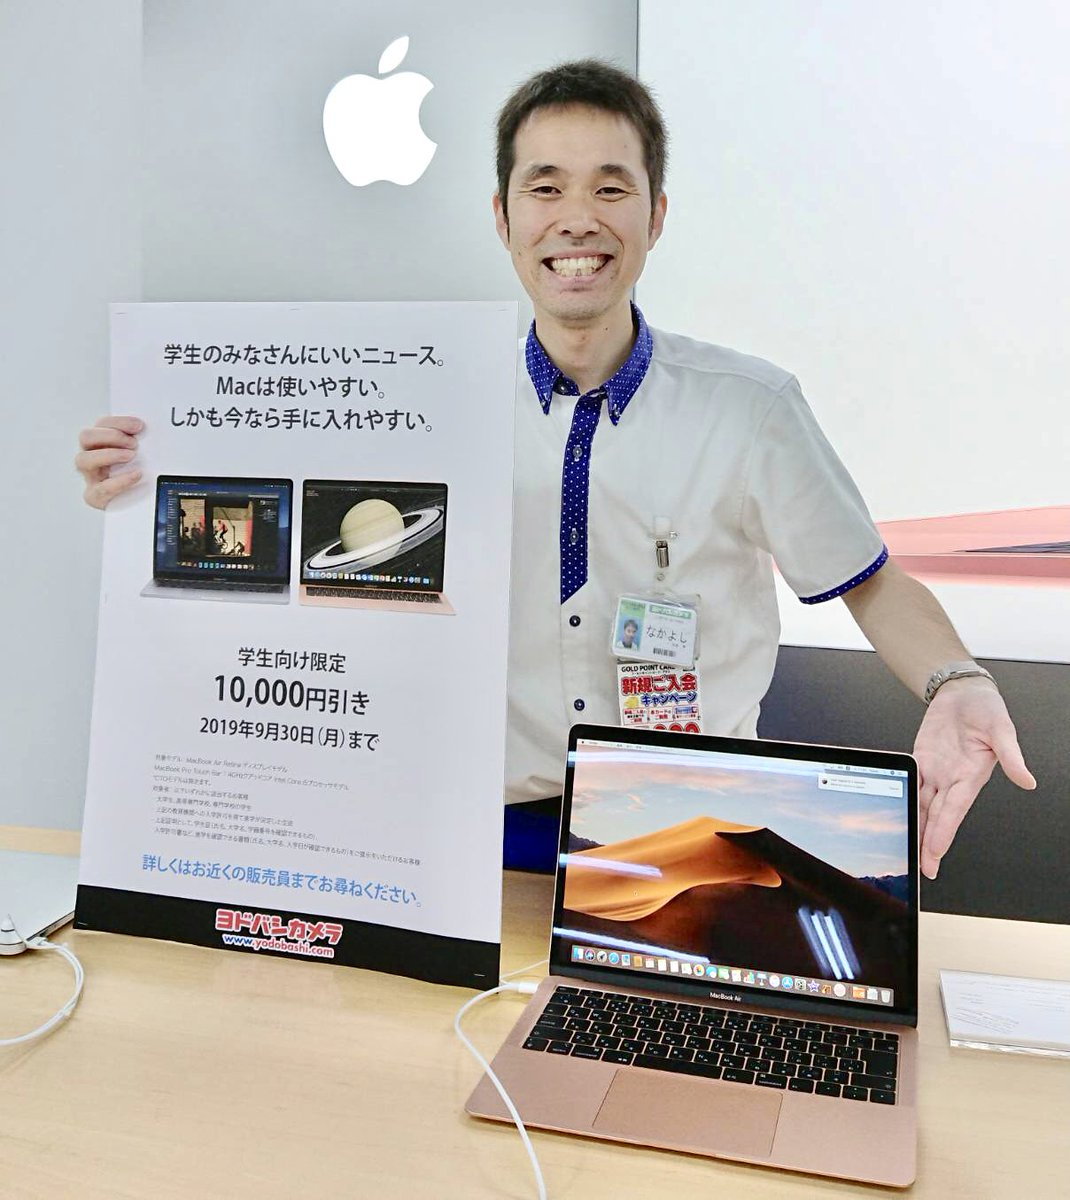 macbook air 学割